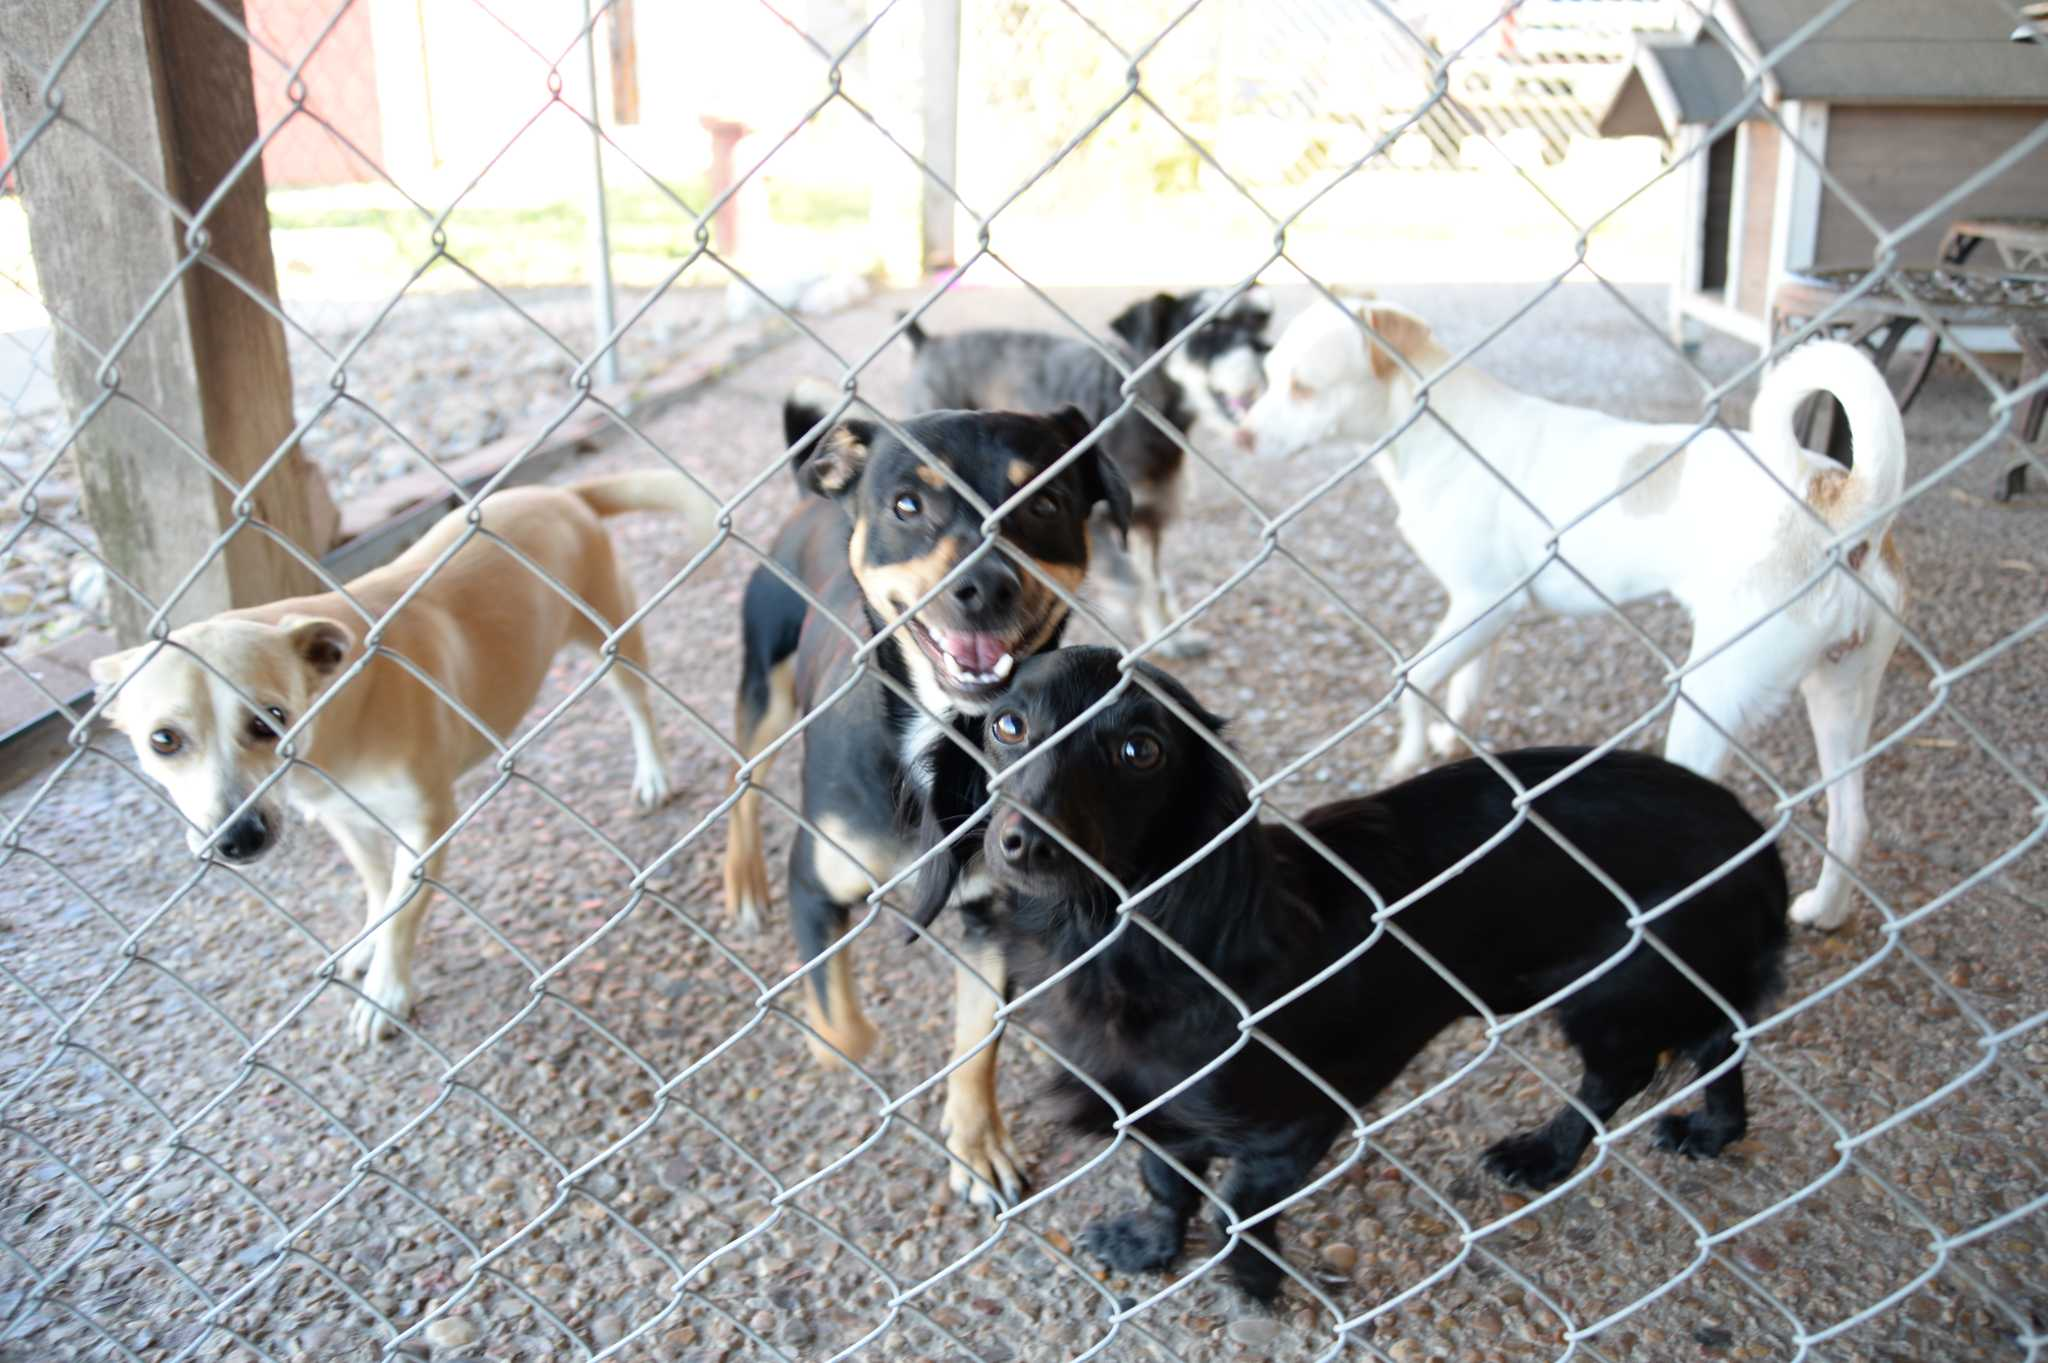 Harvey generates increased interest in pet adoptions in Pasadena